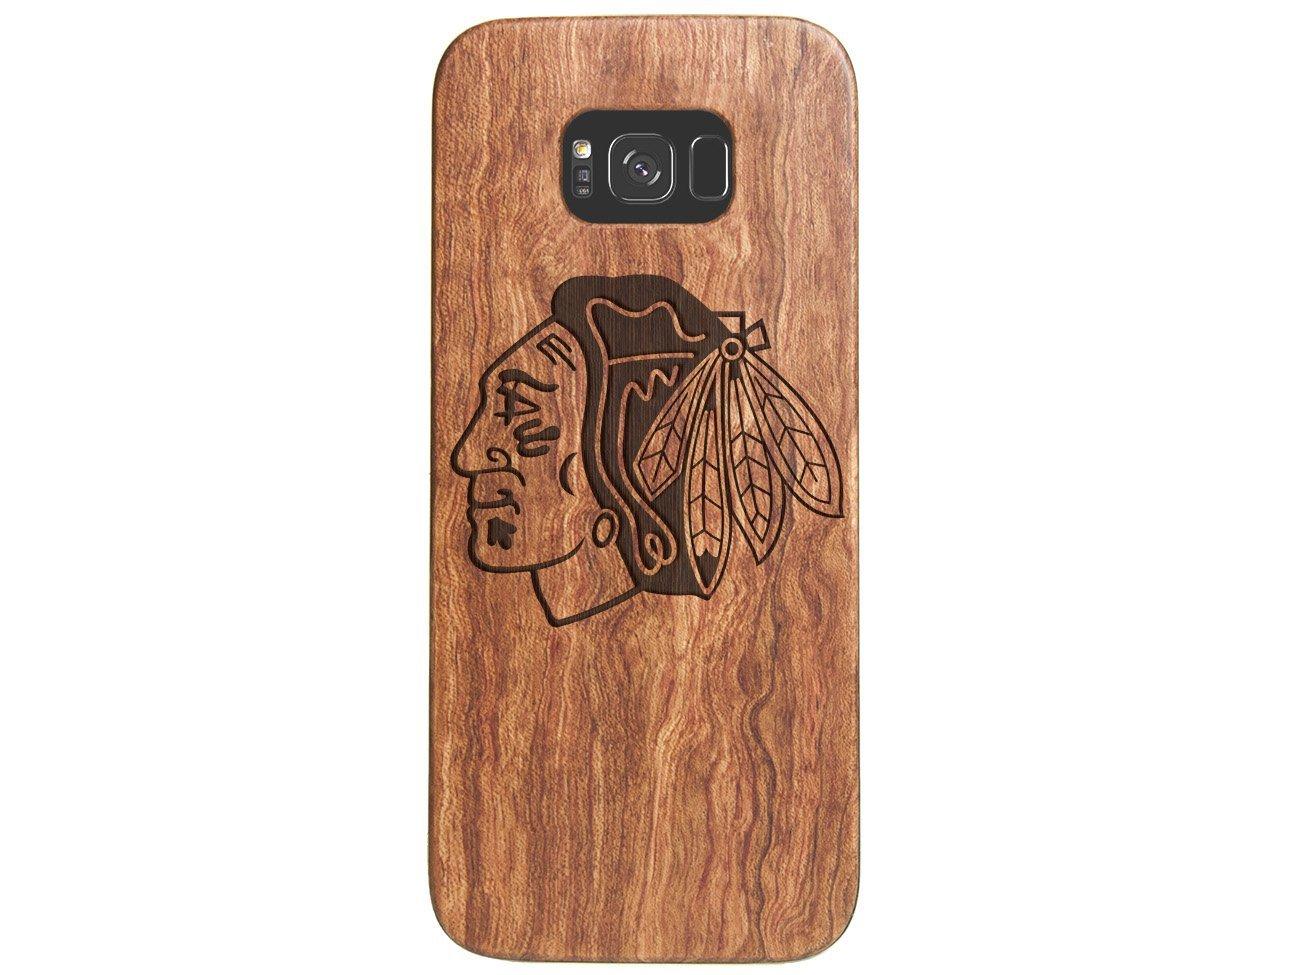 Chicago Blackhawks Galaxy S8 Plus Case